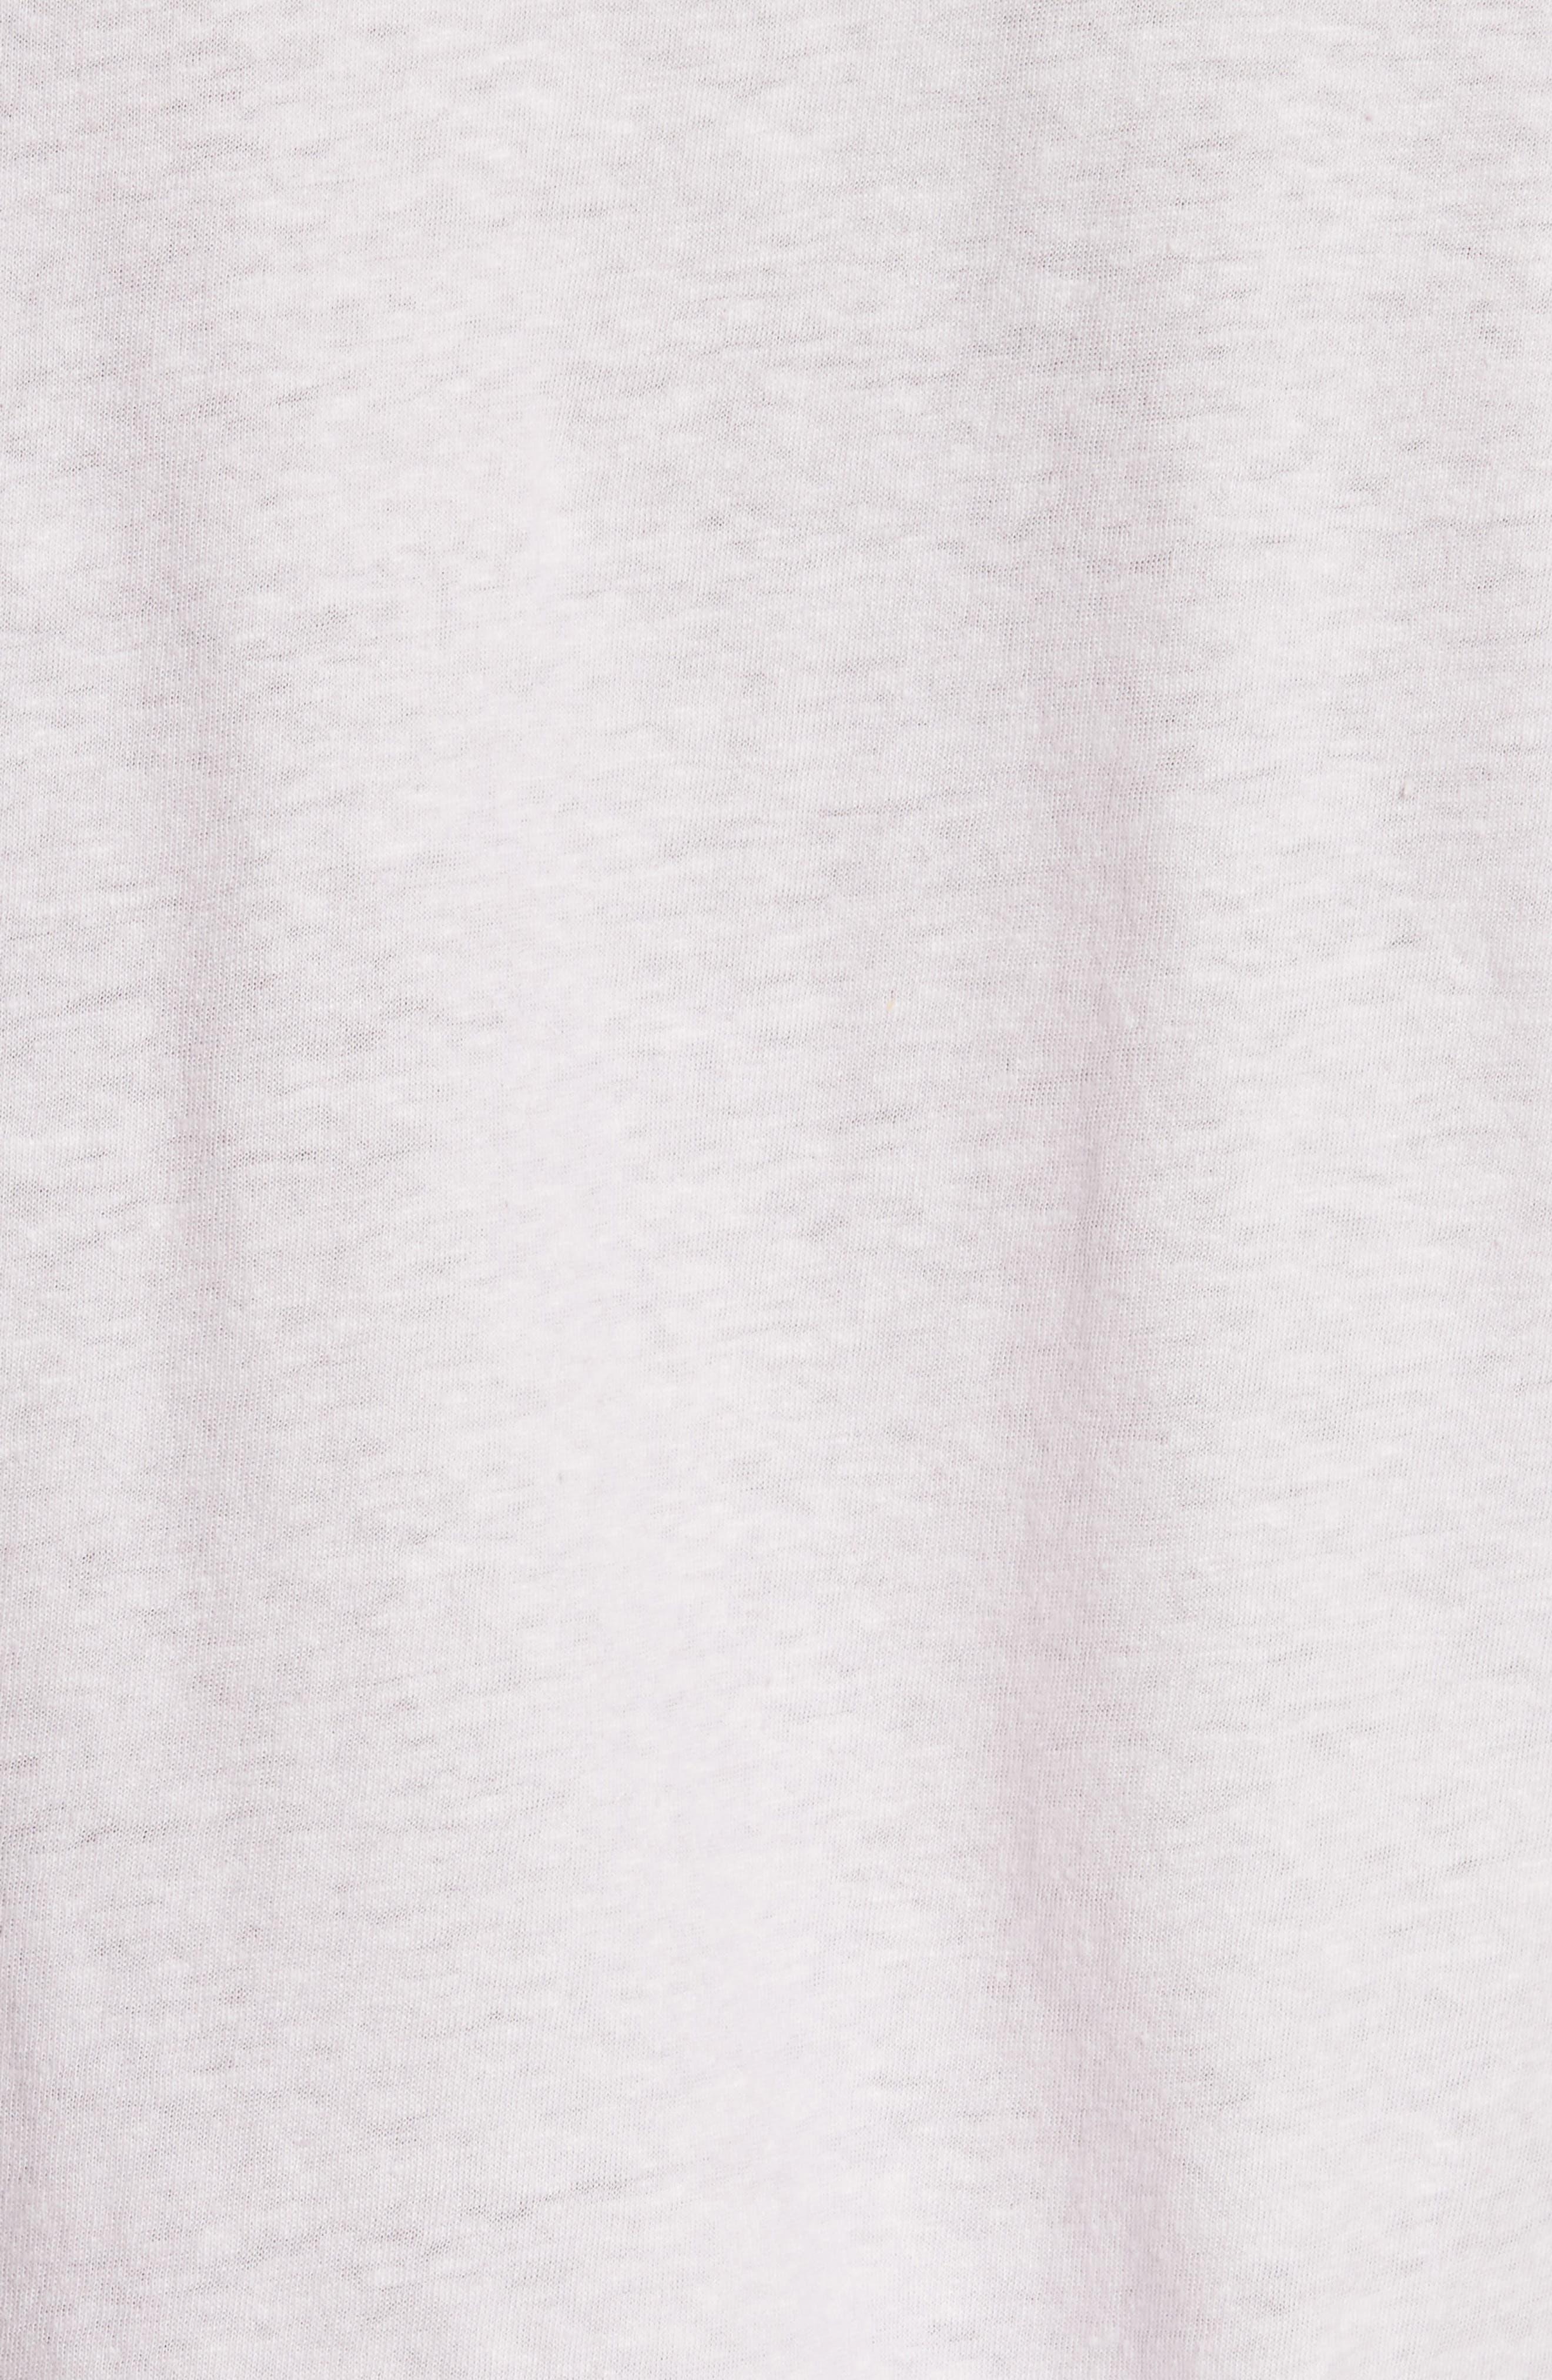 Flutter Sleeve Tee,                             Alternate thumbnail 5, color,                             Lilac Dust